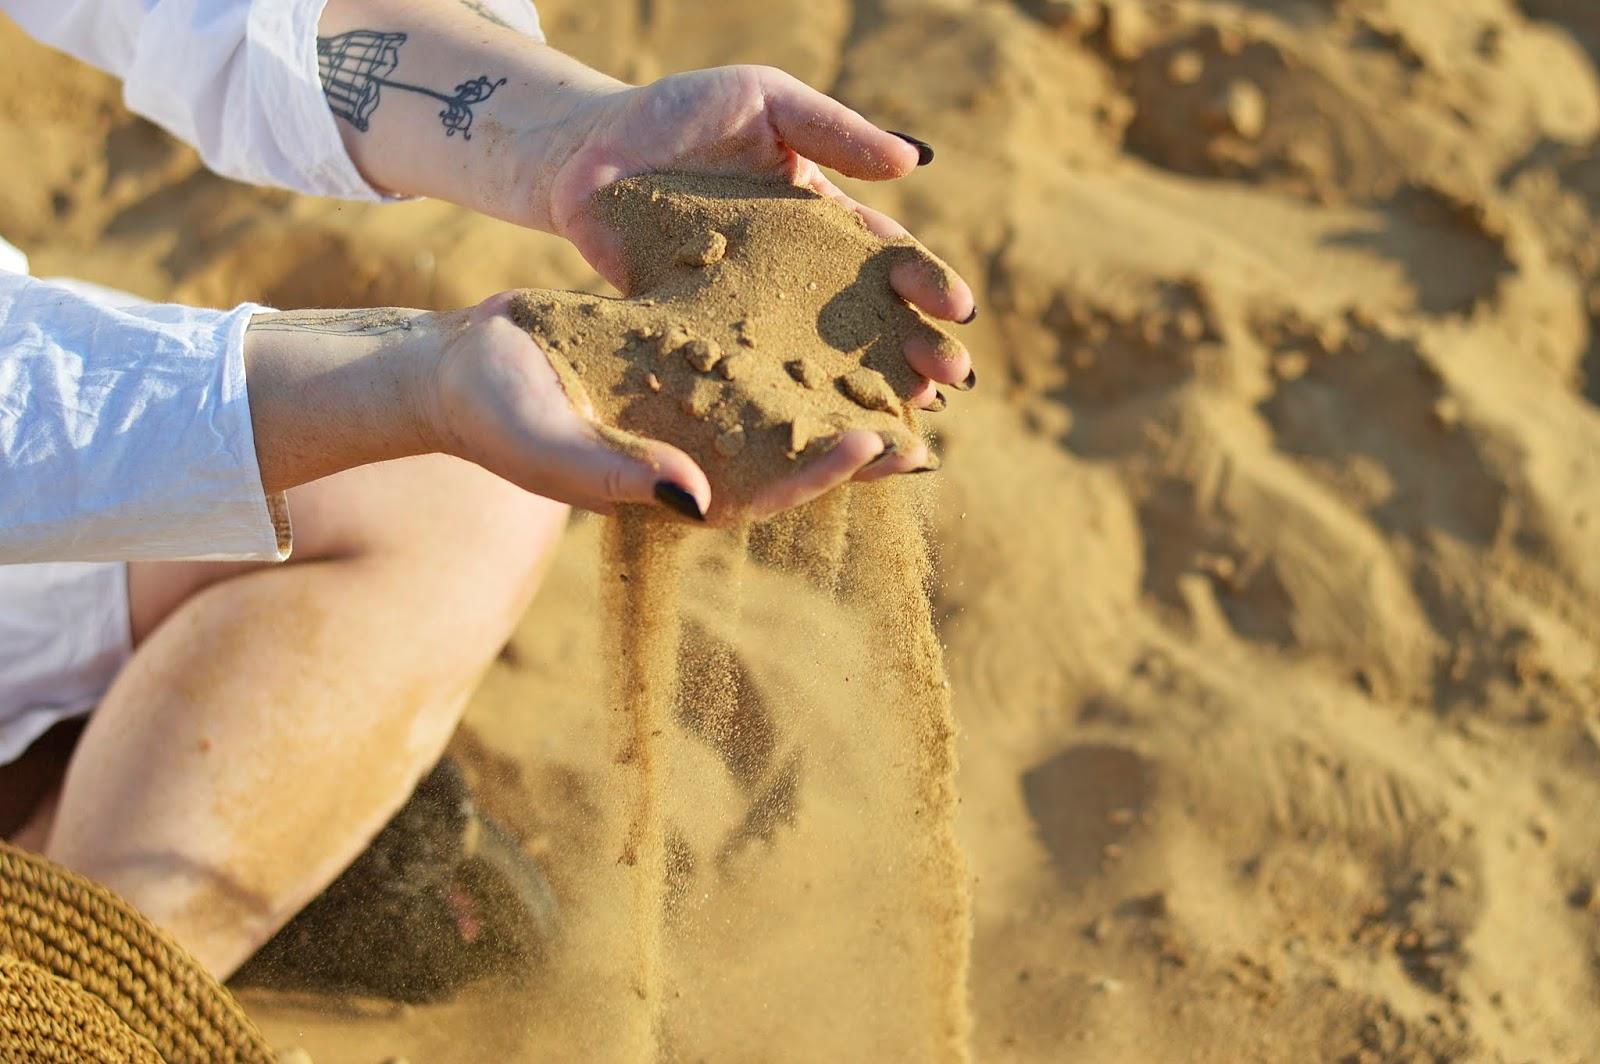 Sand, piasek, summer, hot, white shirt